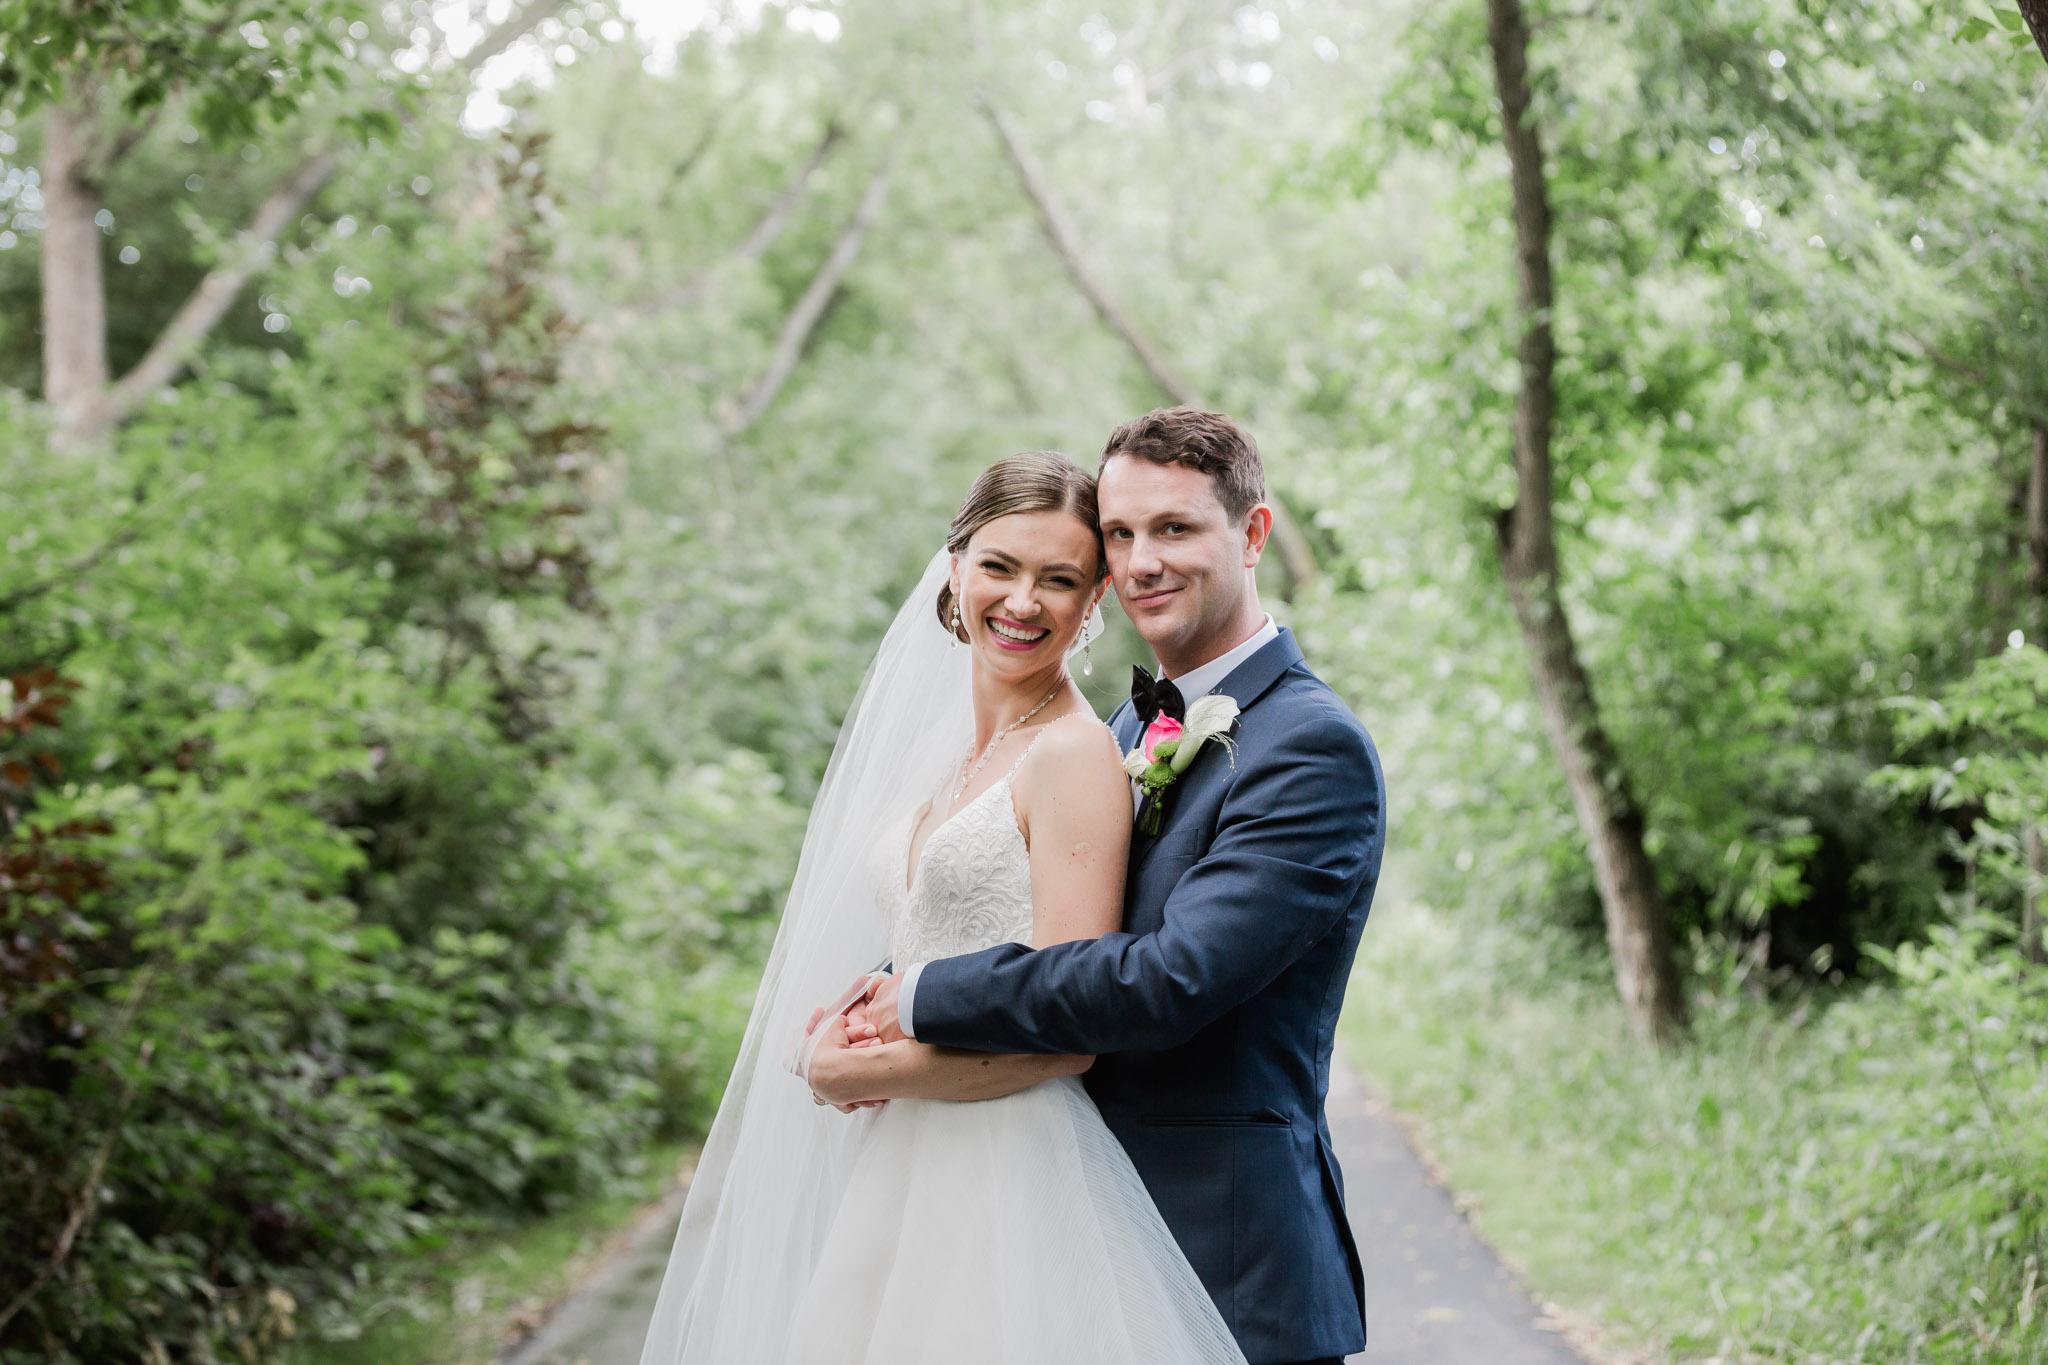 Romatic Wedding Images